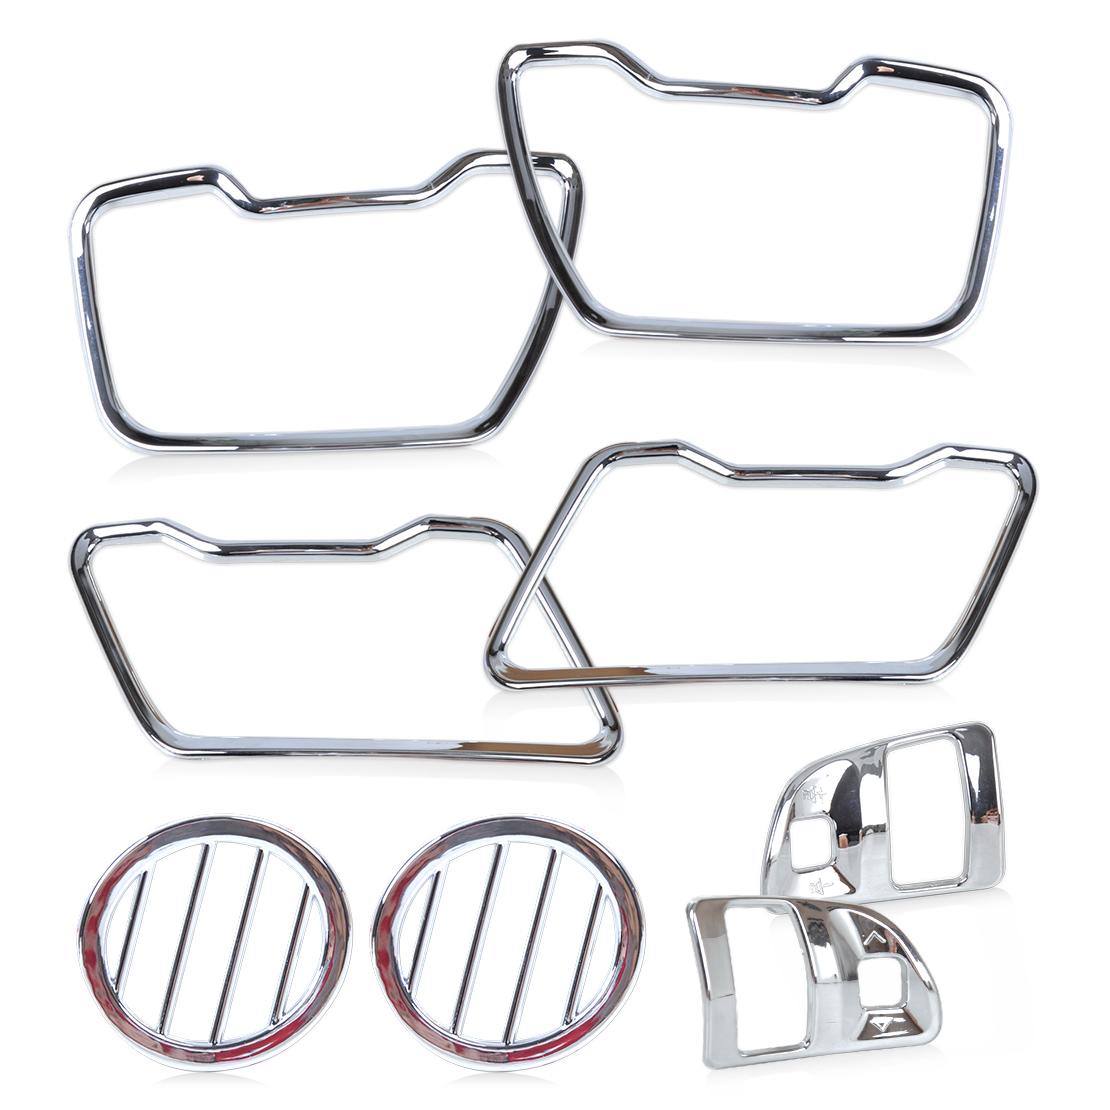 8x Chrome Interior Air Vent Duct Trim Wheel Cover For Kia Sportage R 15